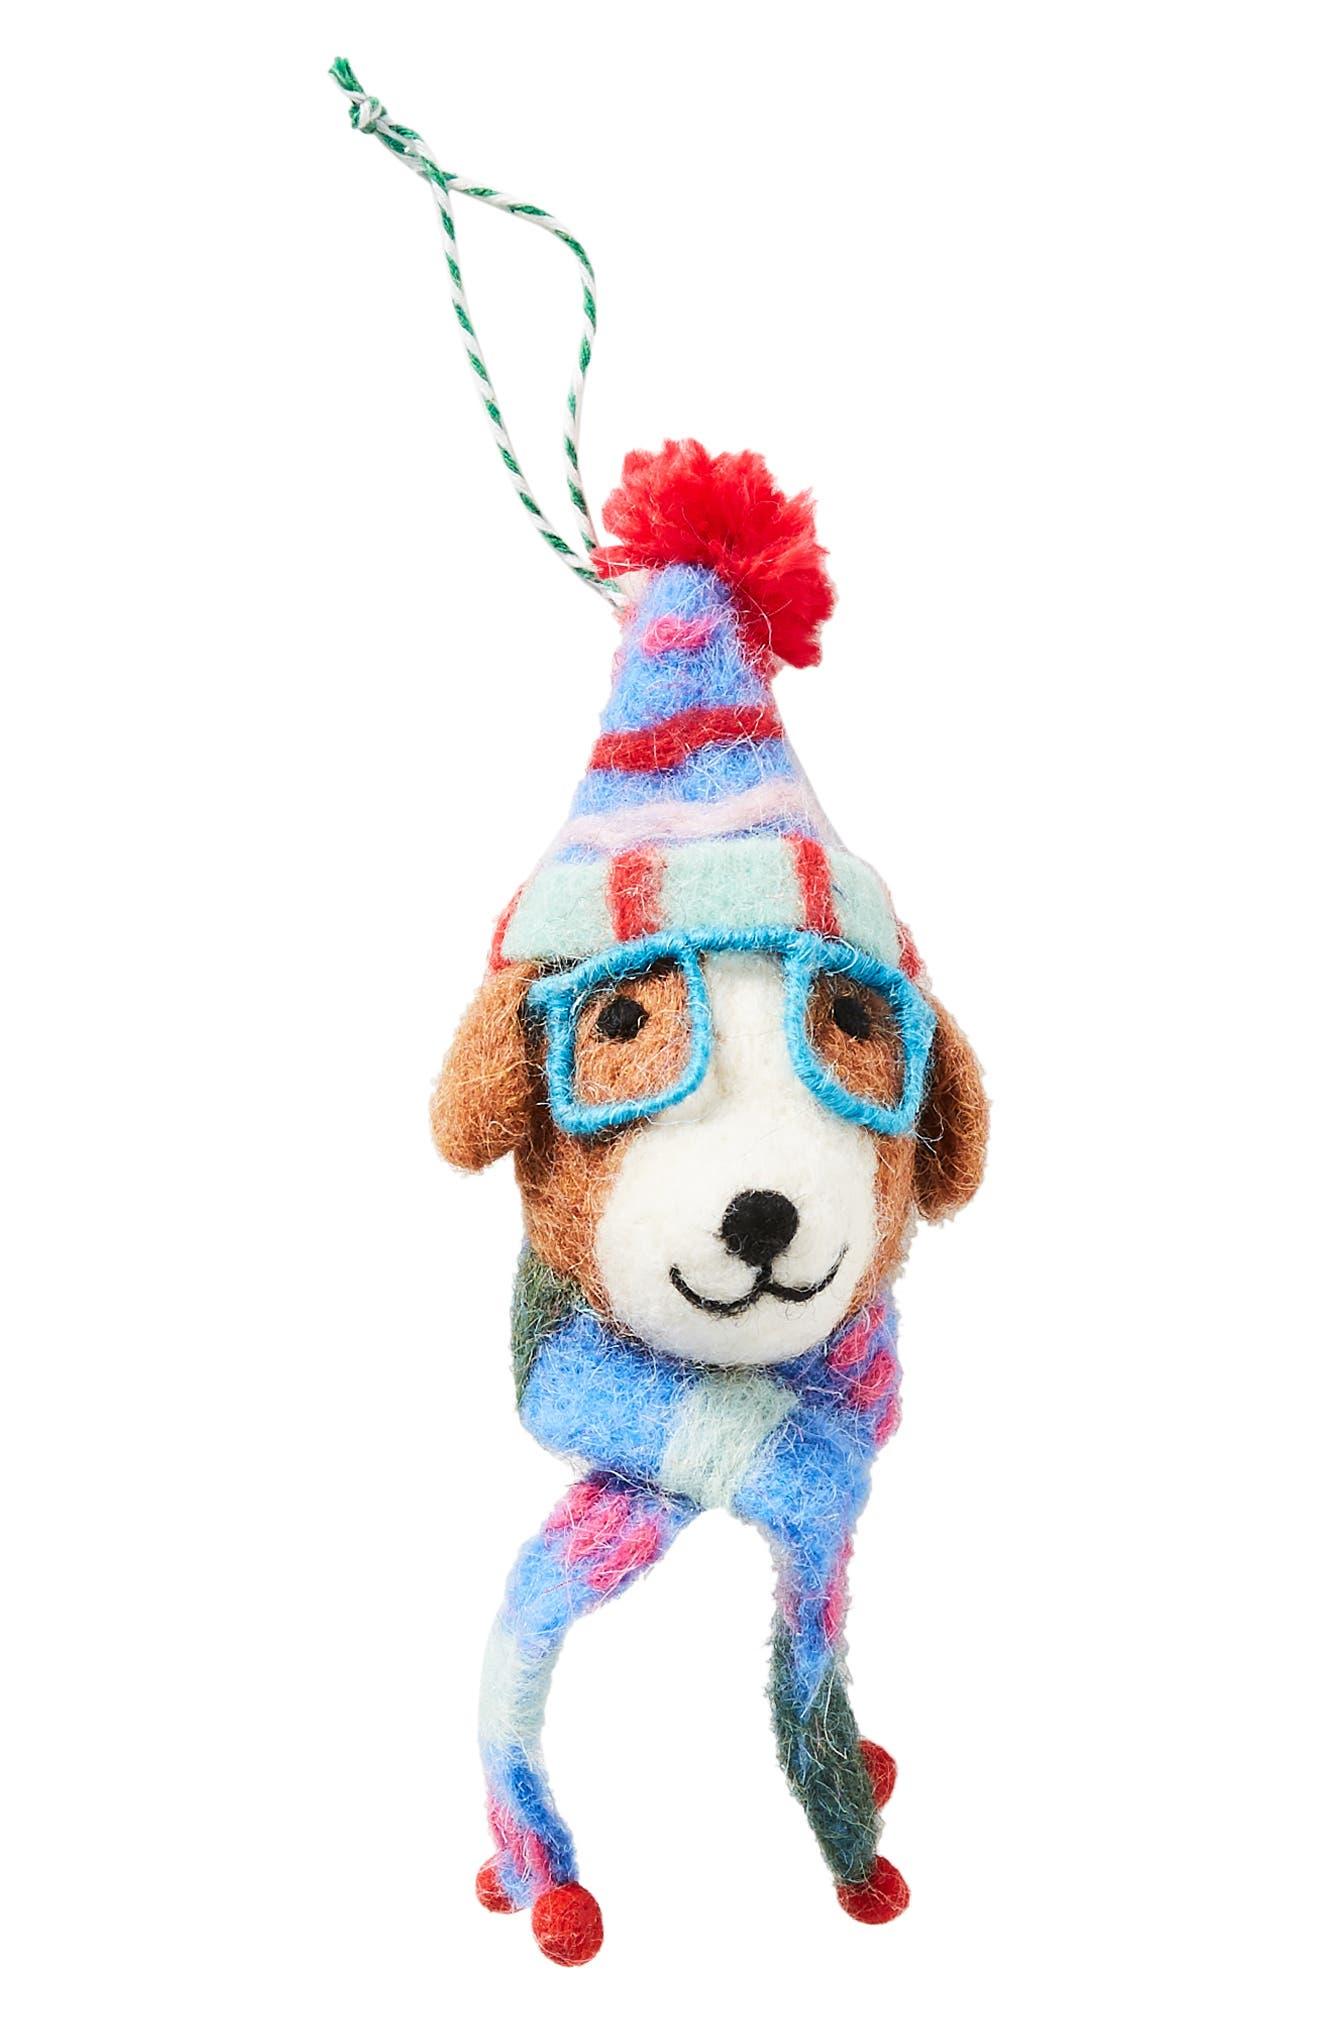 ANTHROPOLOGIE,                             Decked Out Dog Felt Ornament,                             Alternate thumbnail 3, color,                             200